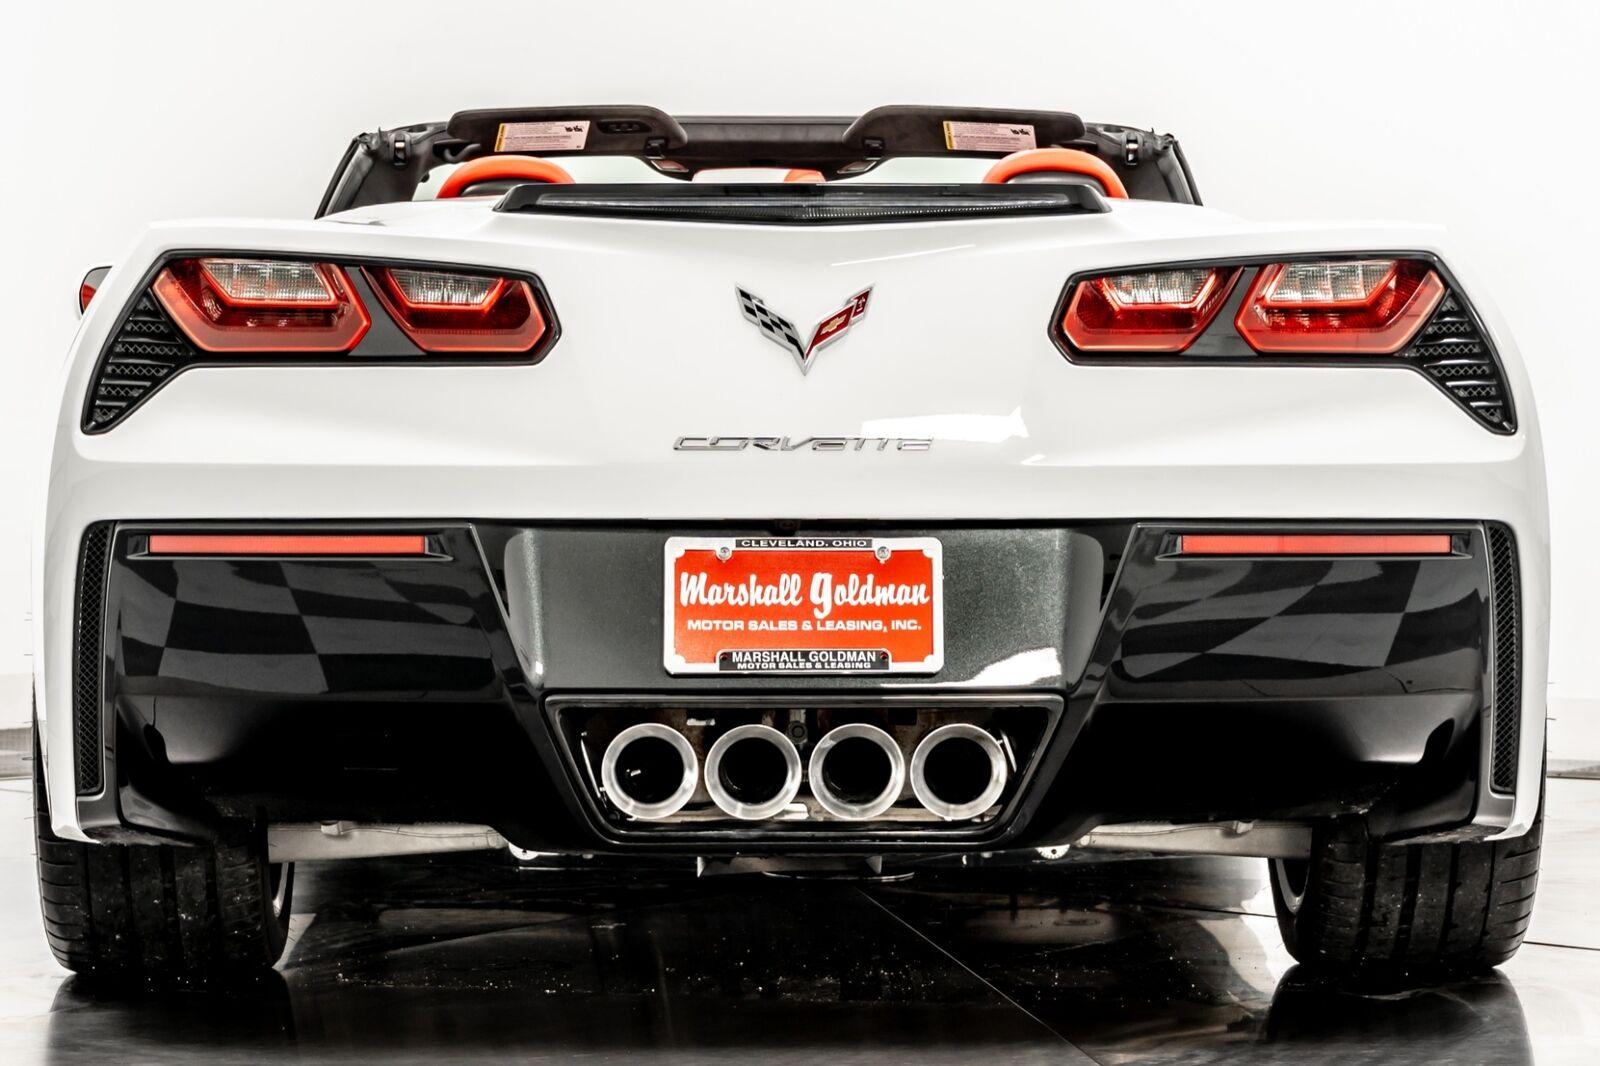 2015 White Chevrolet Corvette Convertible 3LT   C7 Corvette Photo 7